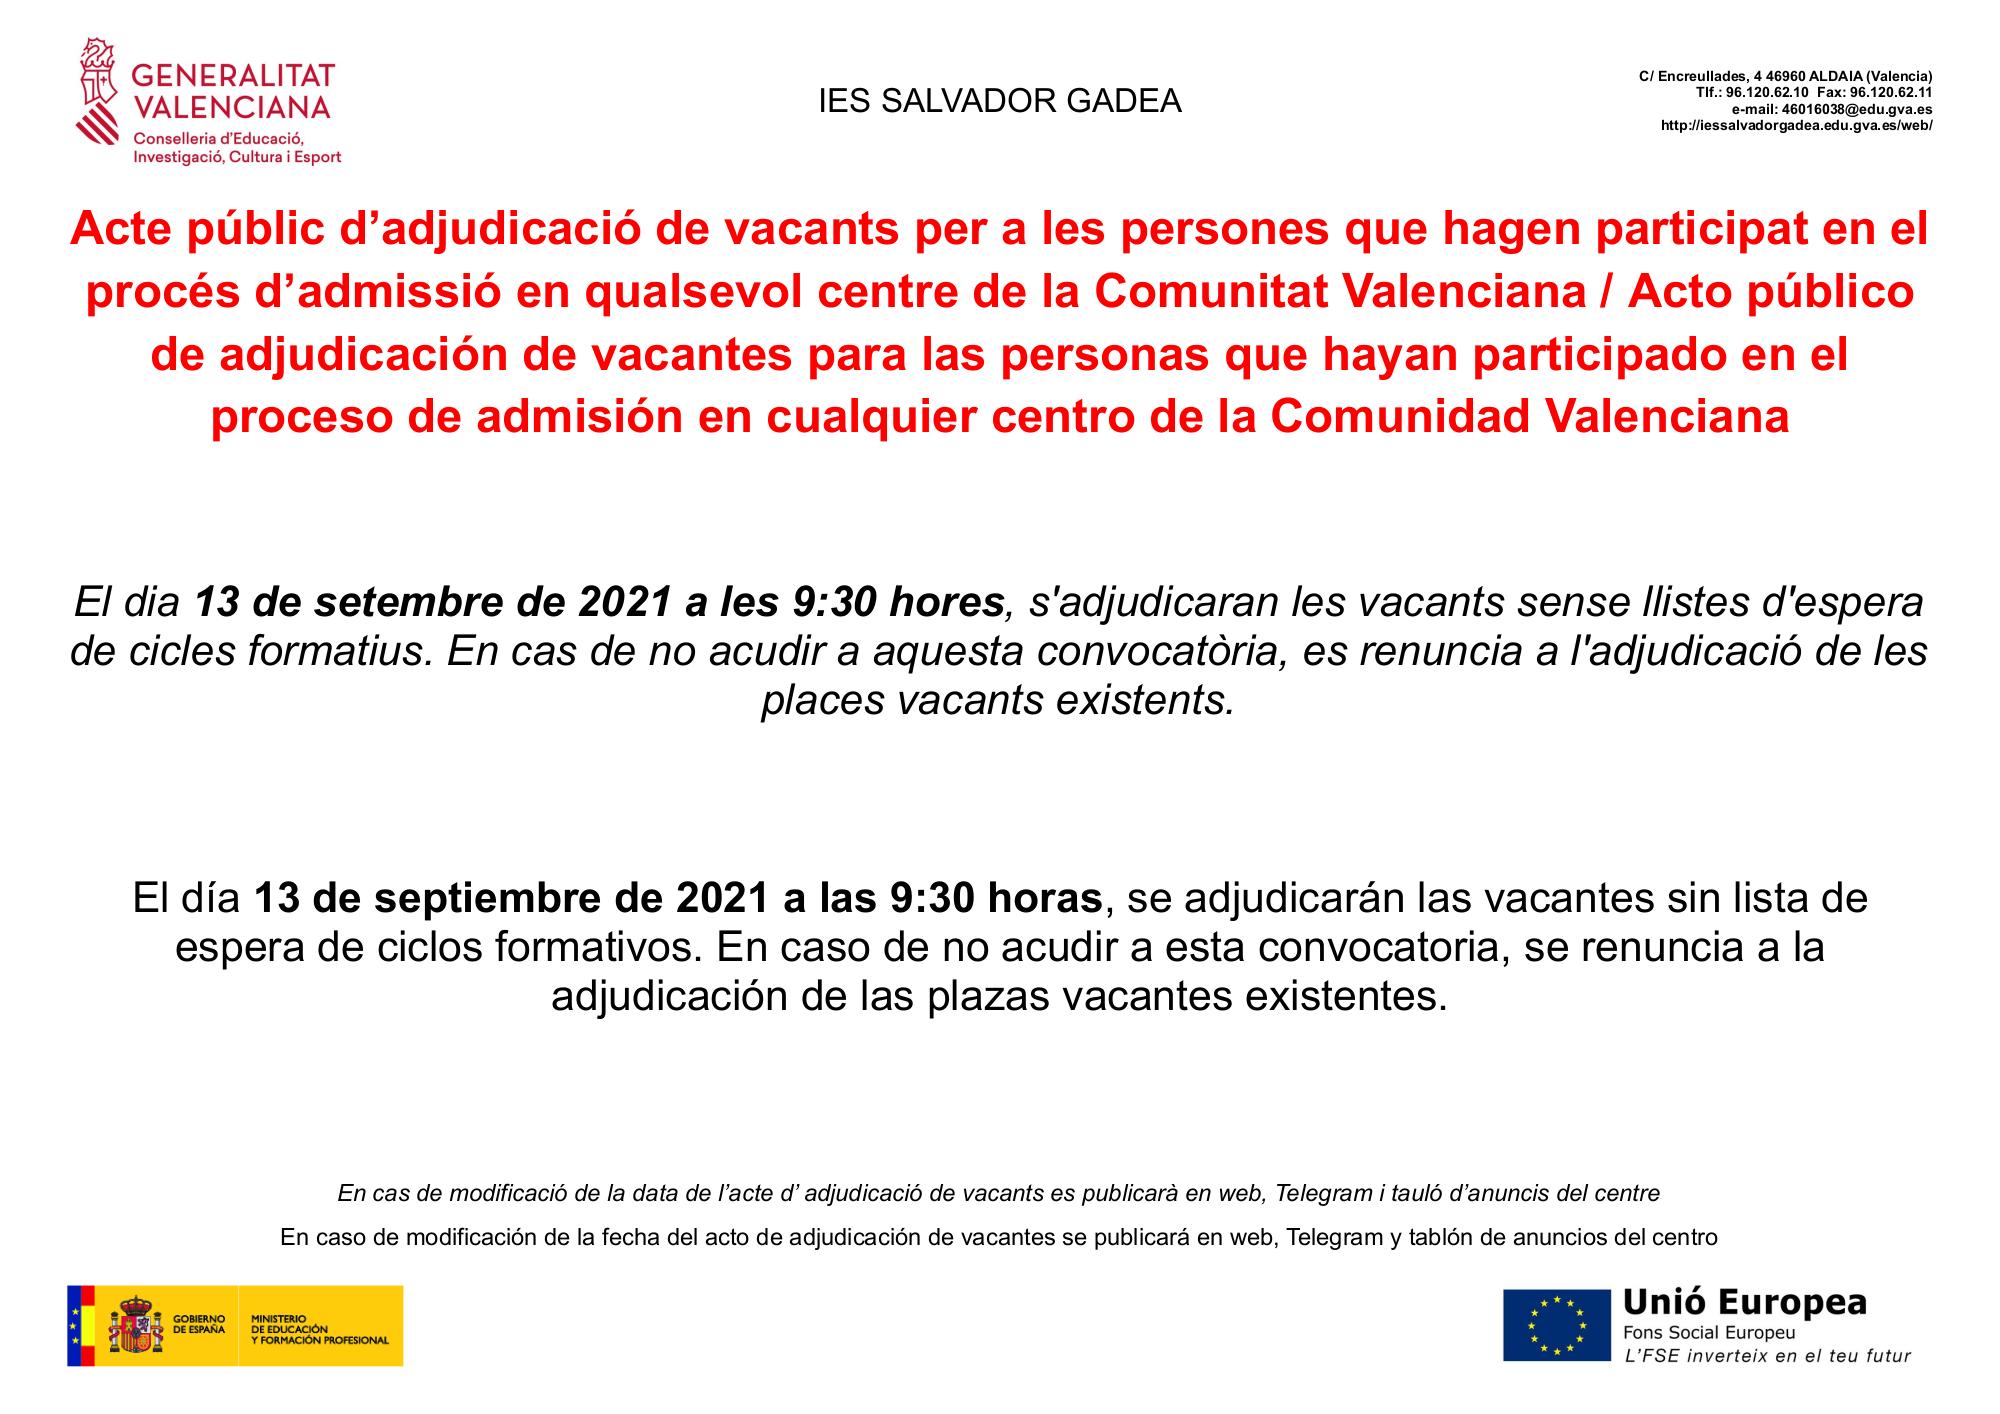 AdjudicacionVacantesProcAdmision2021-2022